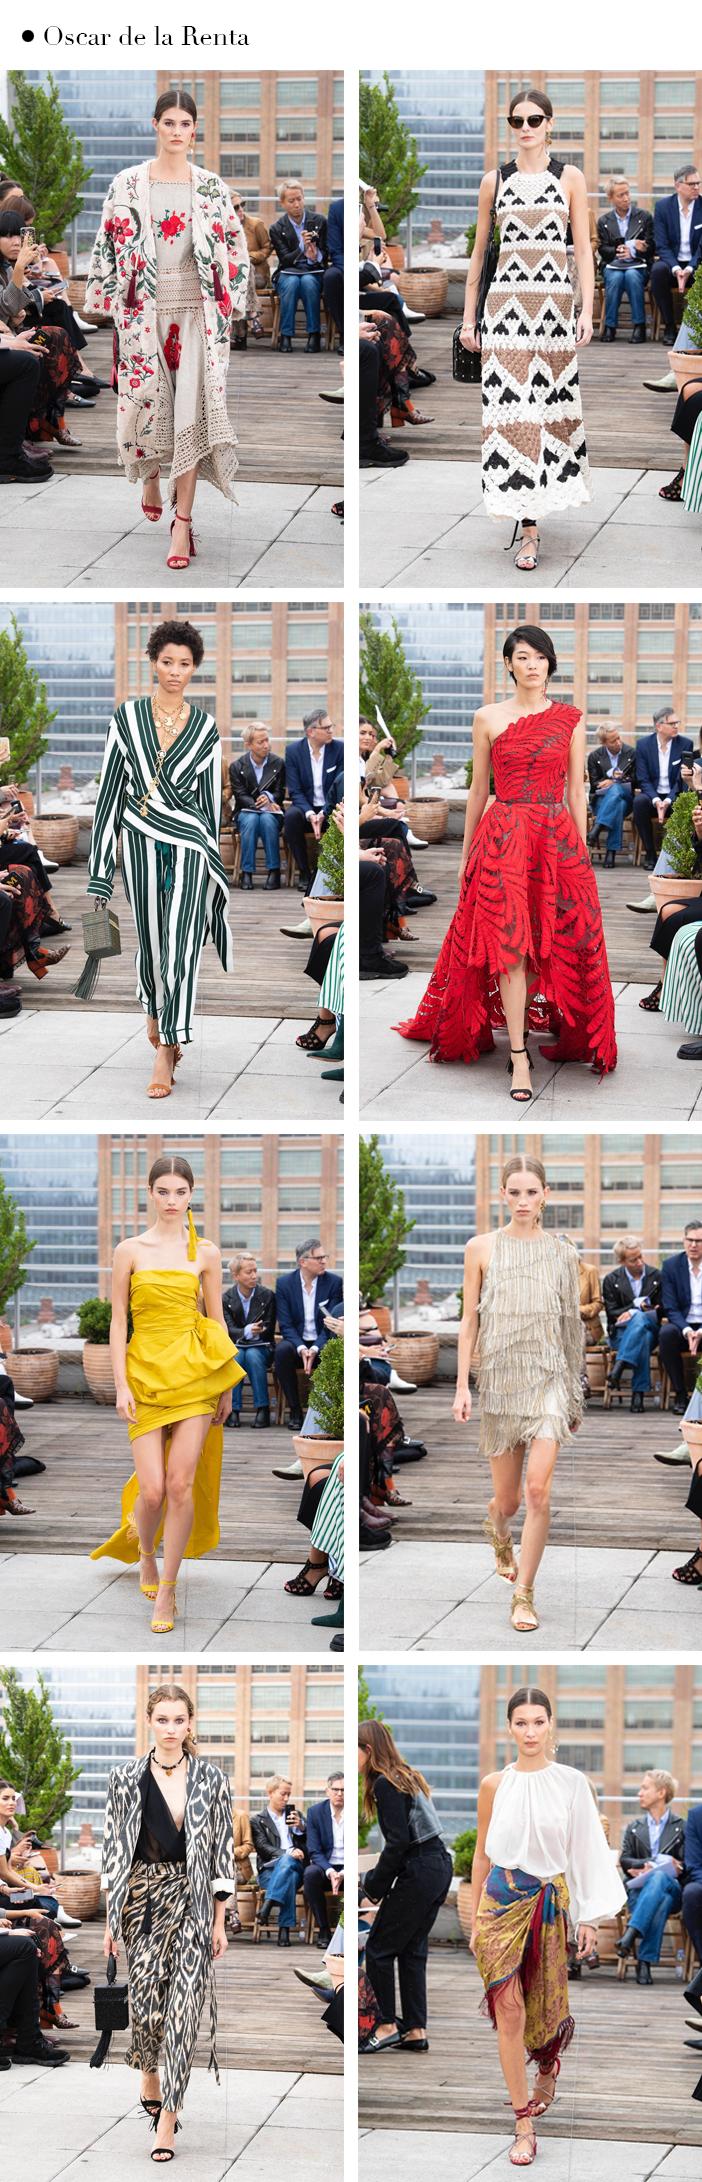 New York fashion week verão 2019 Oscar de la Renta